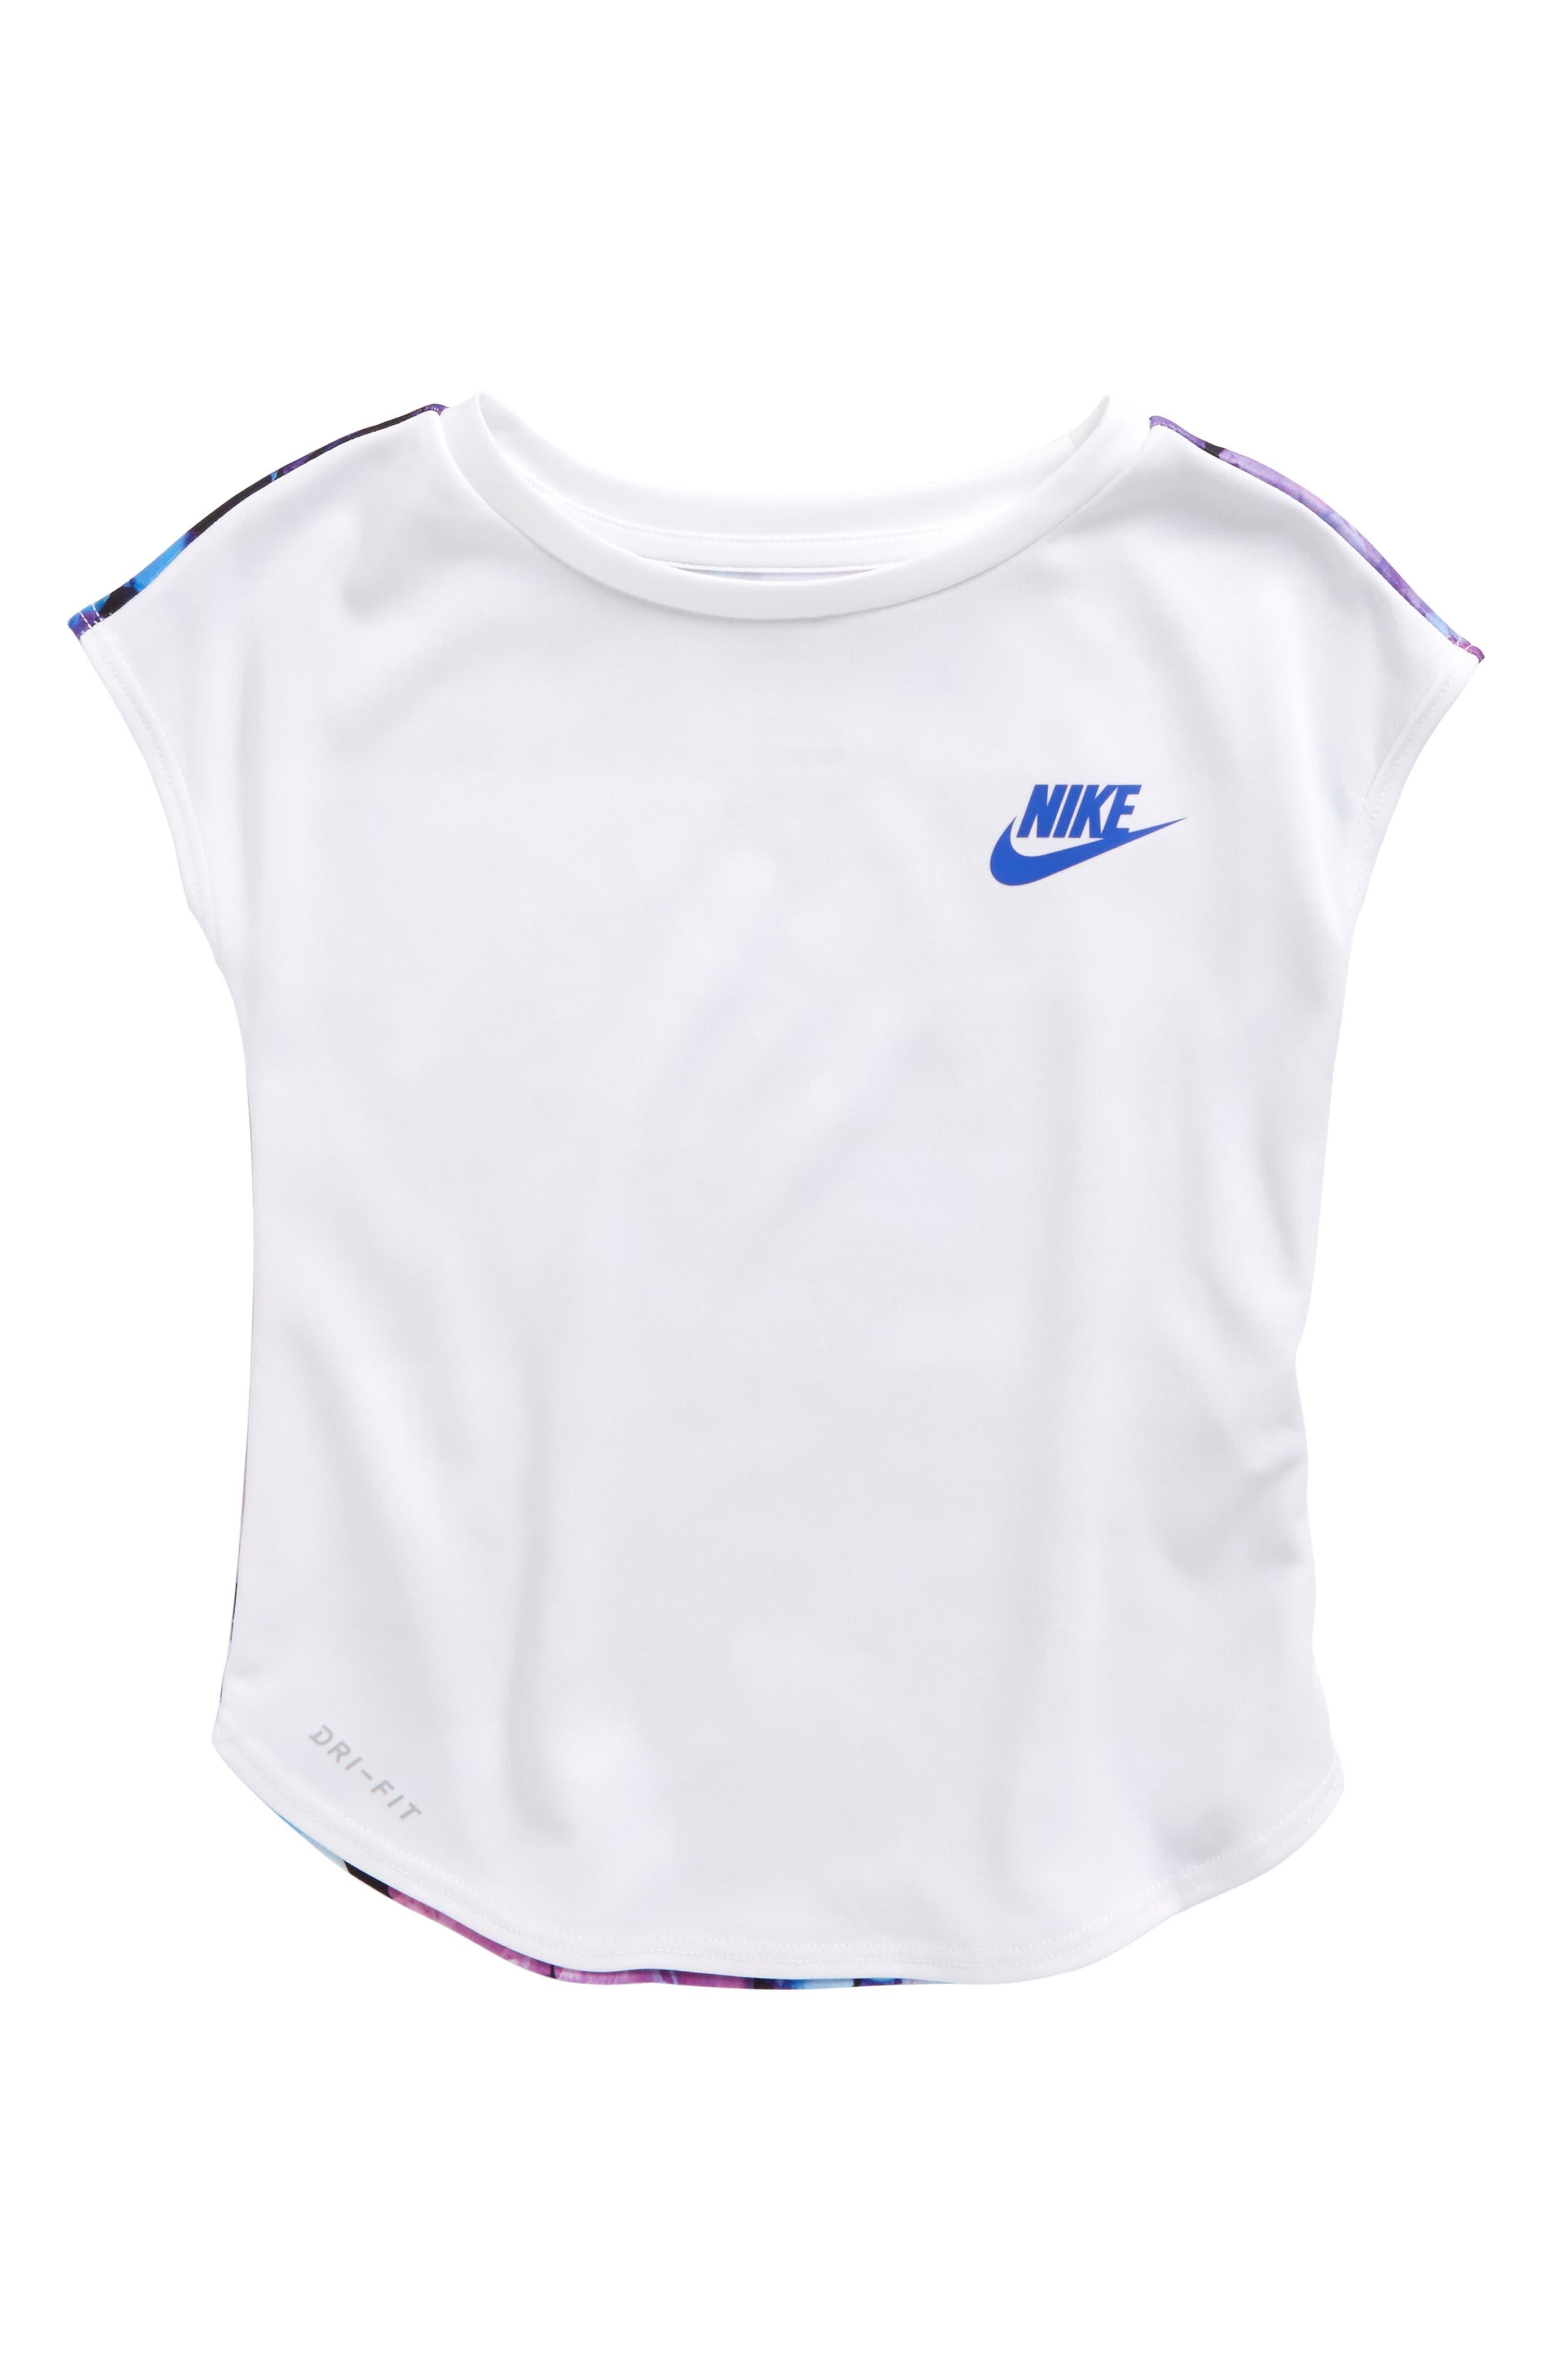 Main Image - Nike Flower Jams Graphic Dry Tee (Toddler Girls & Little Girls)